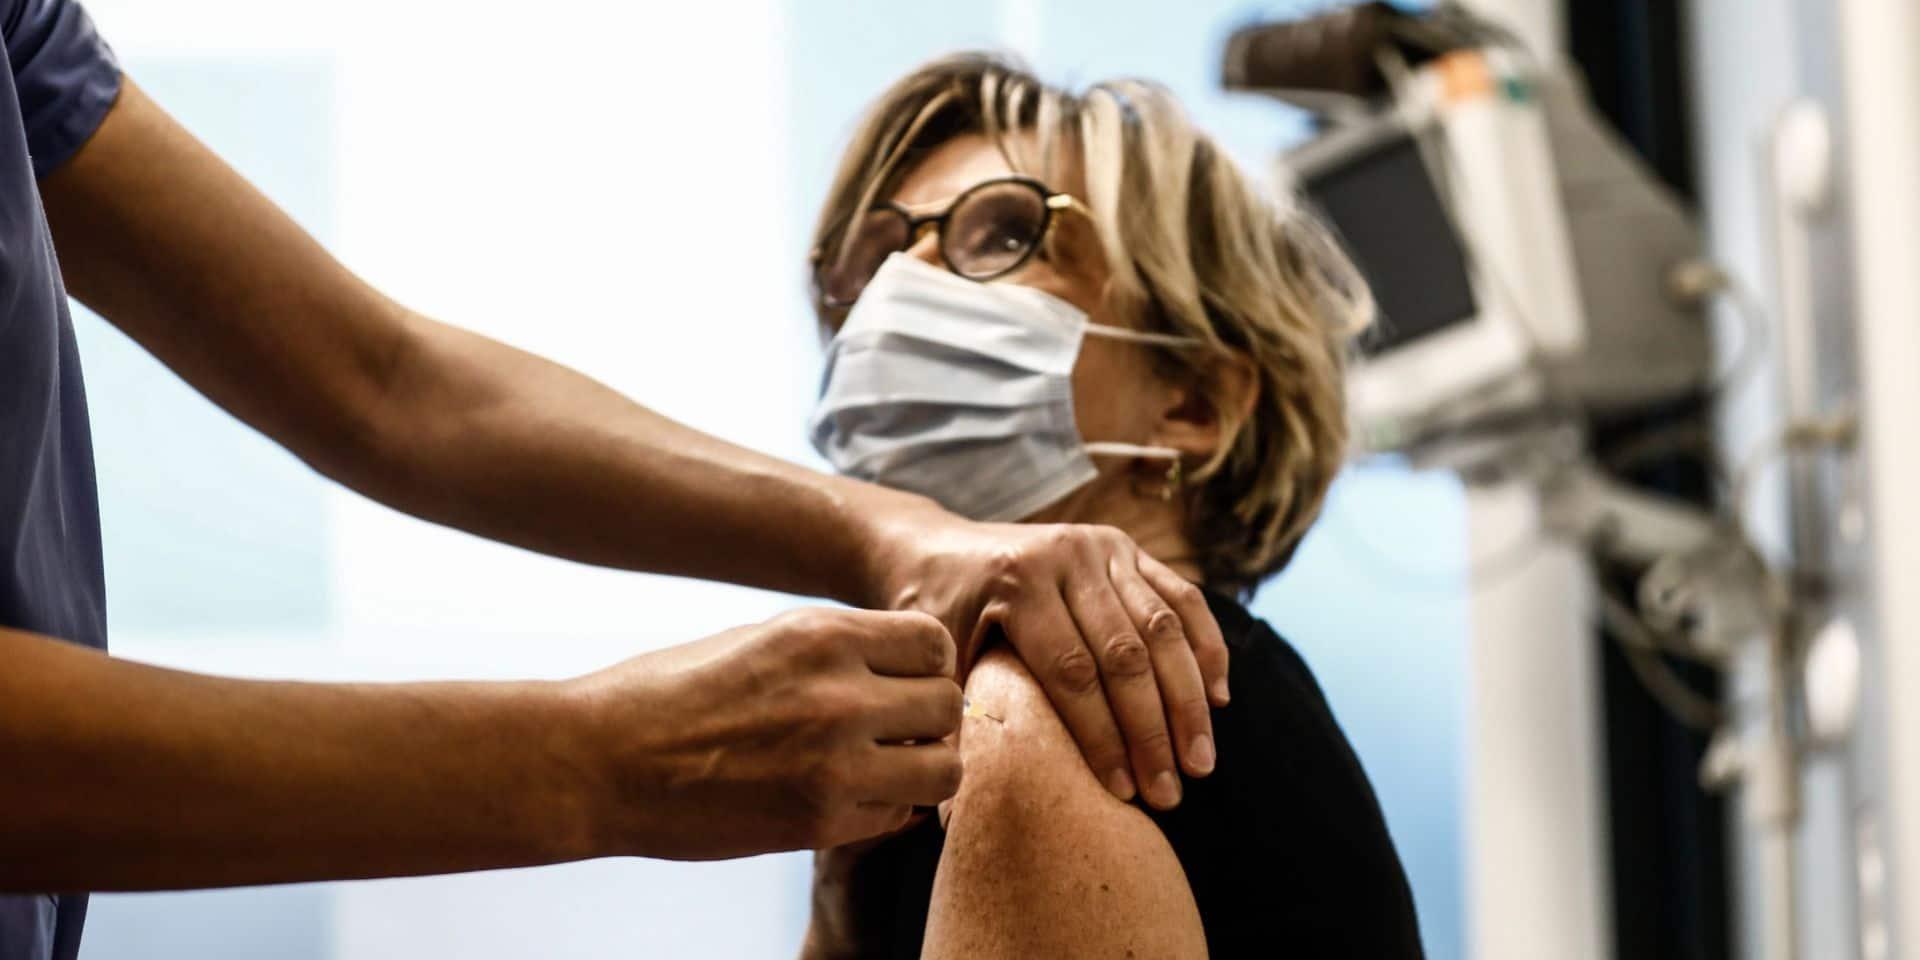 Les Belges recevront bien chacun deux doses du vaccin Pfizer